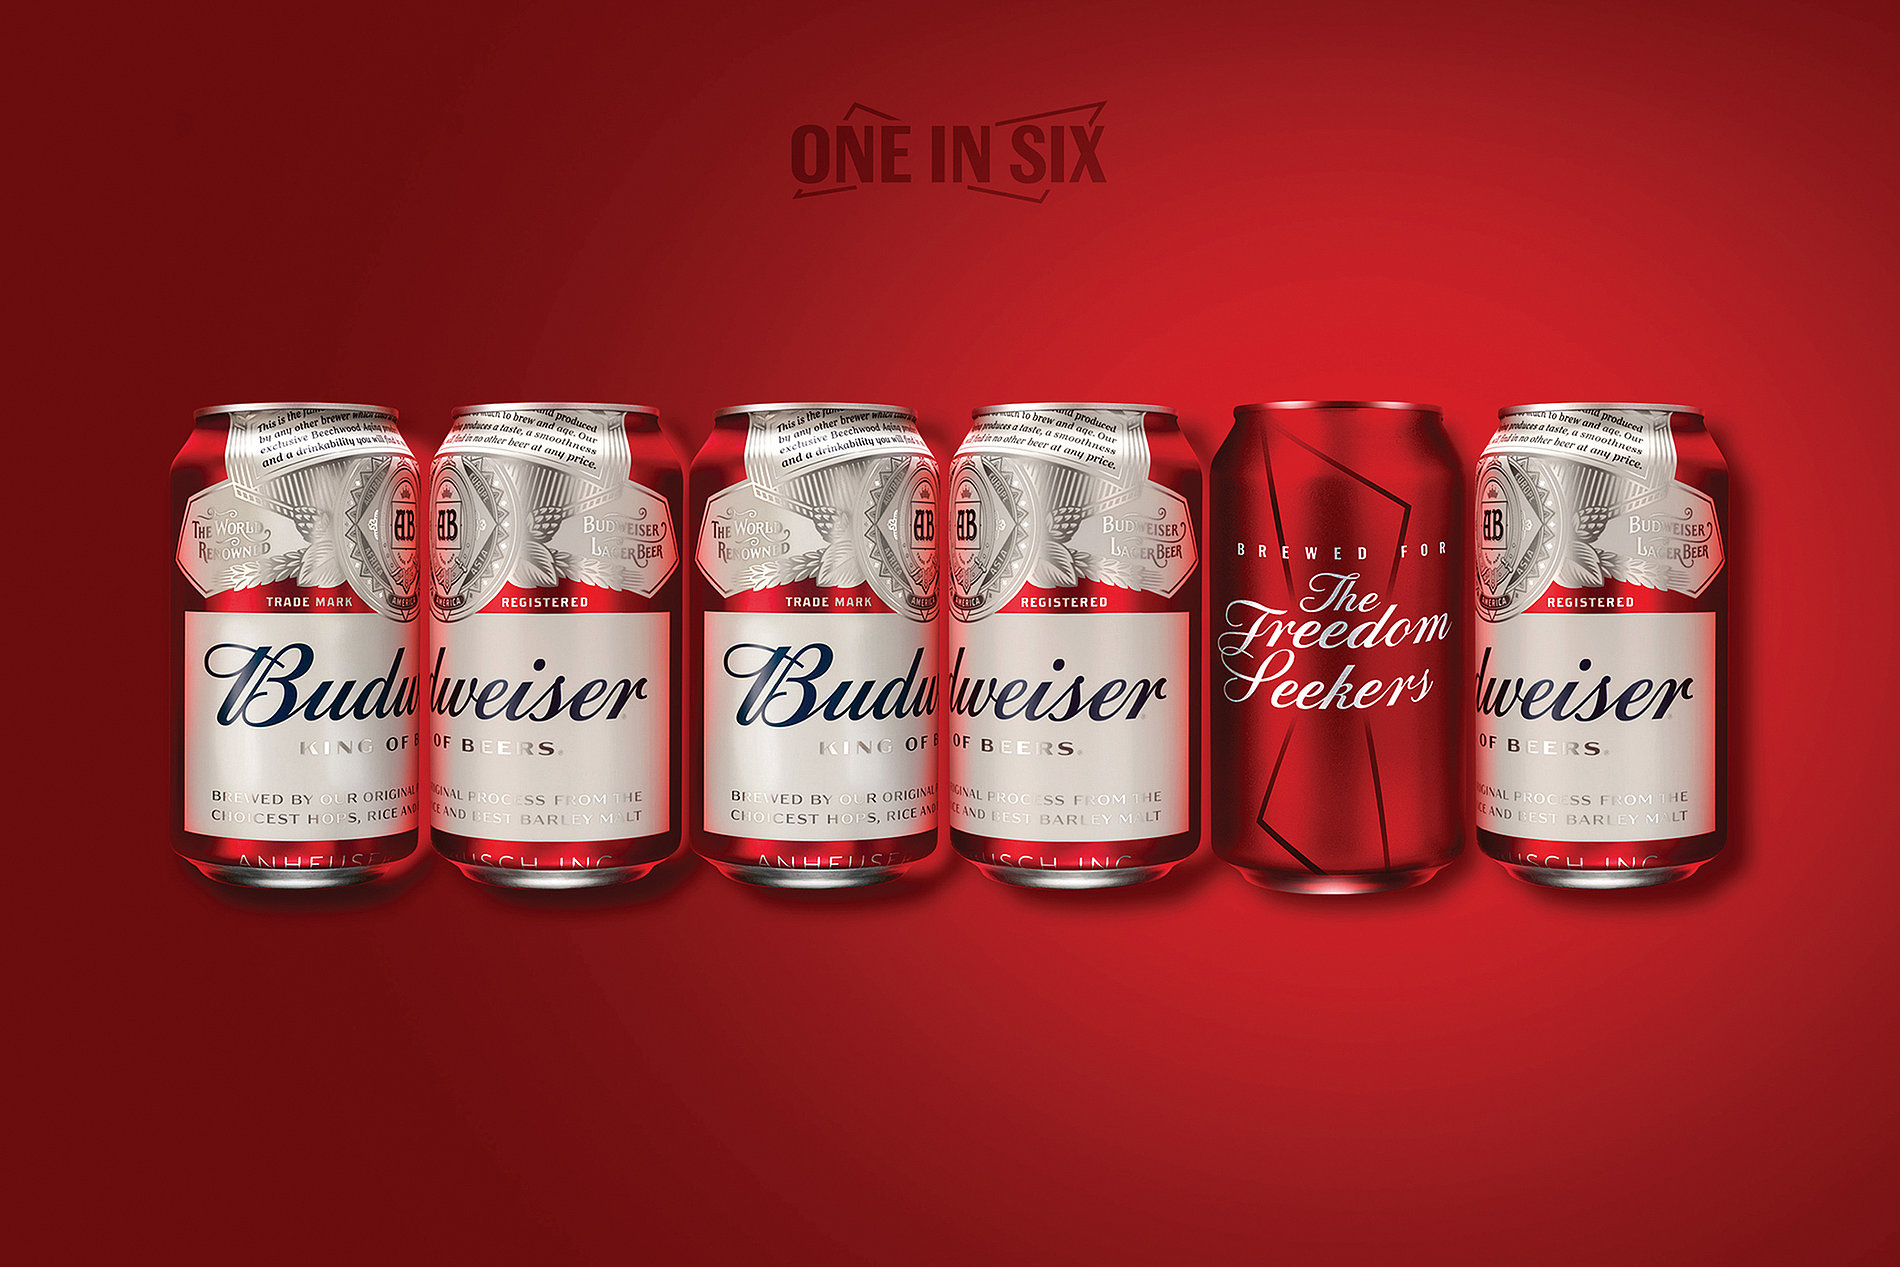 Budweiser One-in-Six | Red Dot Design Award